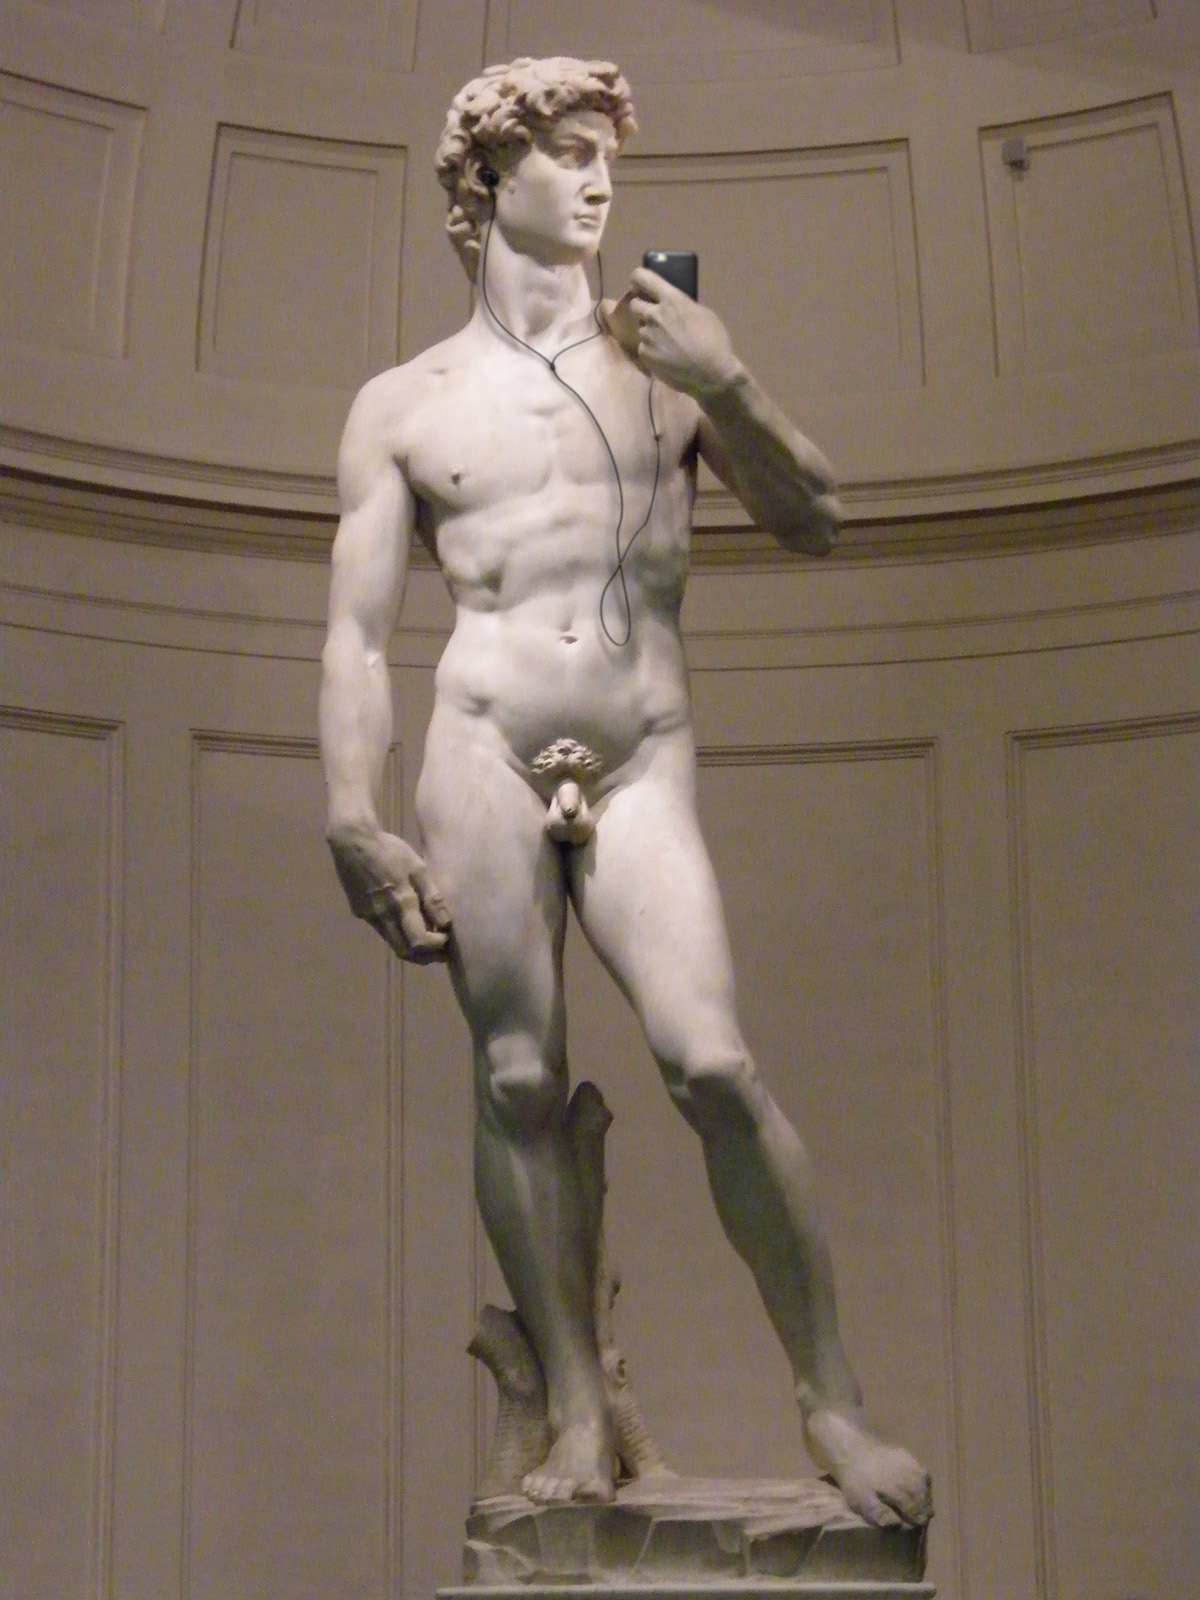 art headphone dali frida ILLUSTRATION  photoshop Da Vinci Michelangelo van gogh munch